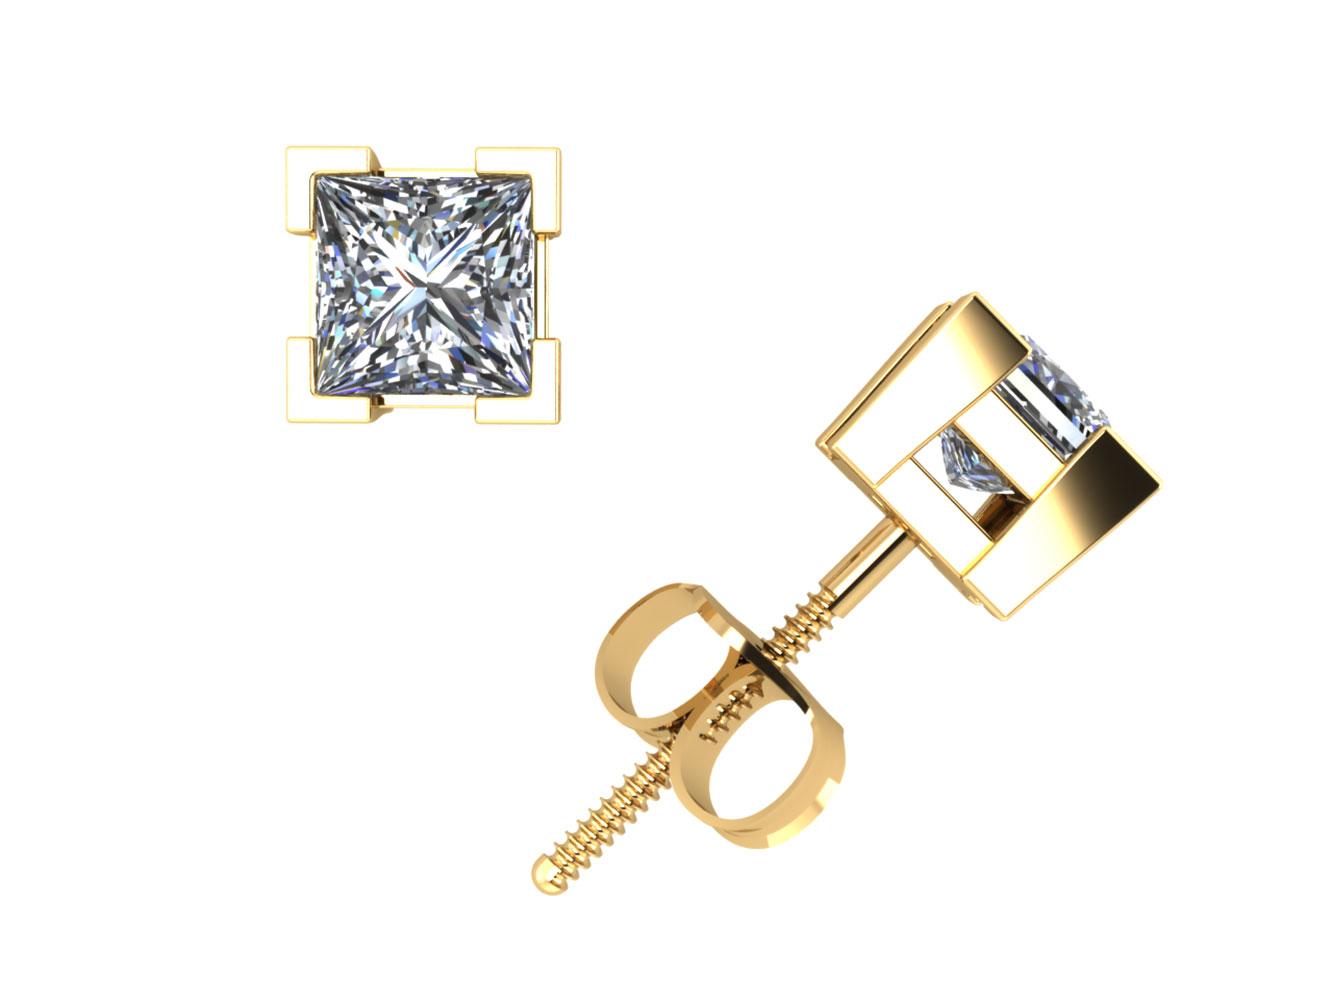 065debff1 Real 0.40Ct Princess Cut Diamond Basket Stud Earrings 14k Gold V-Prong Set  I SI2